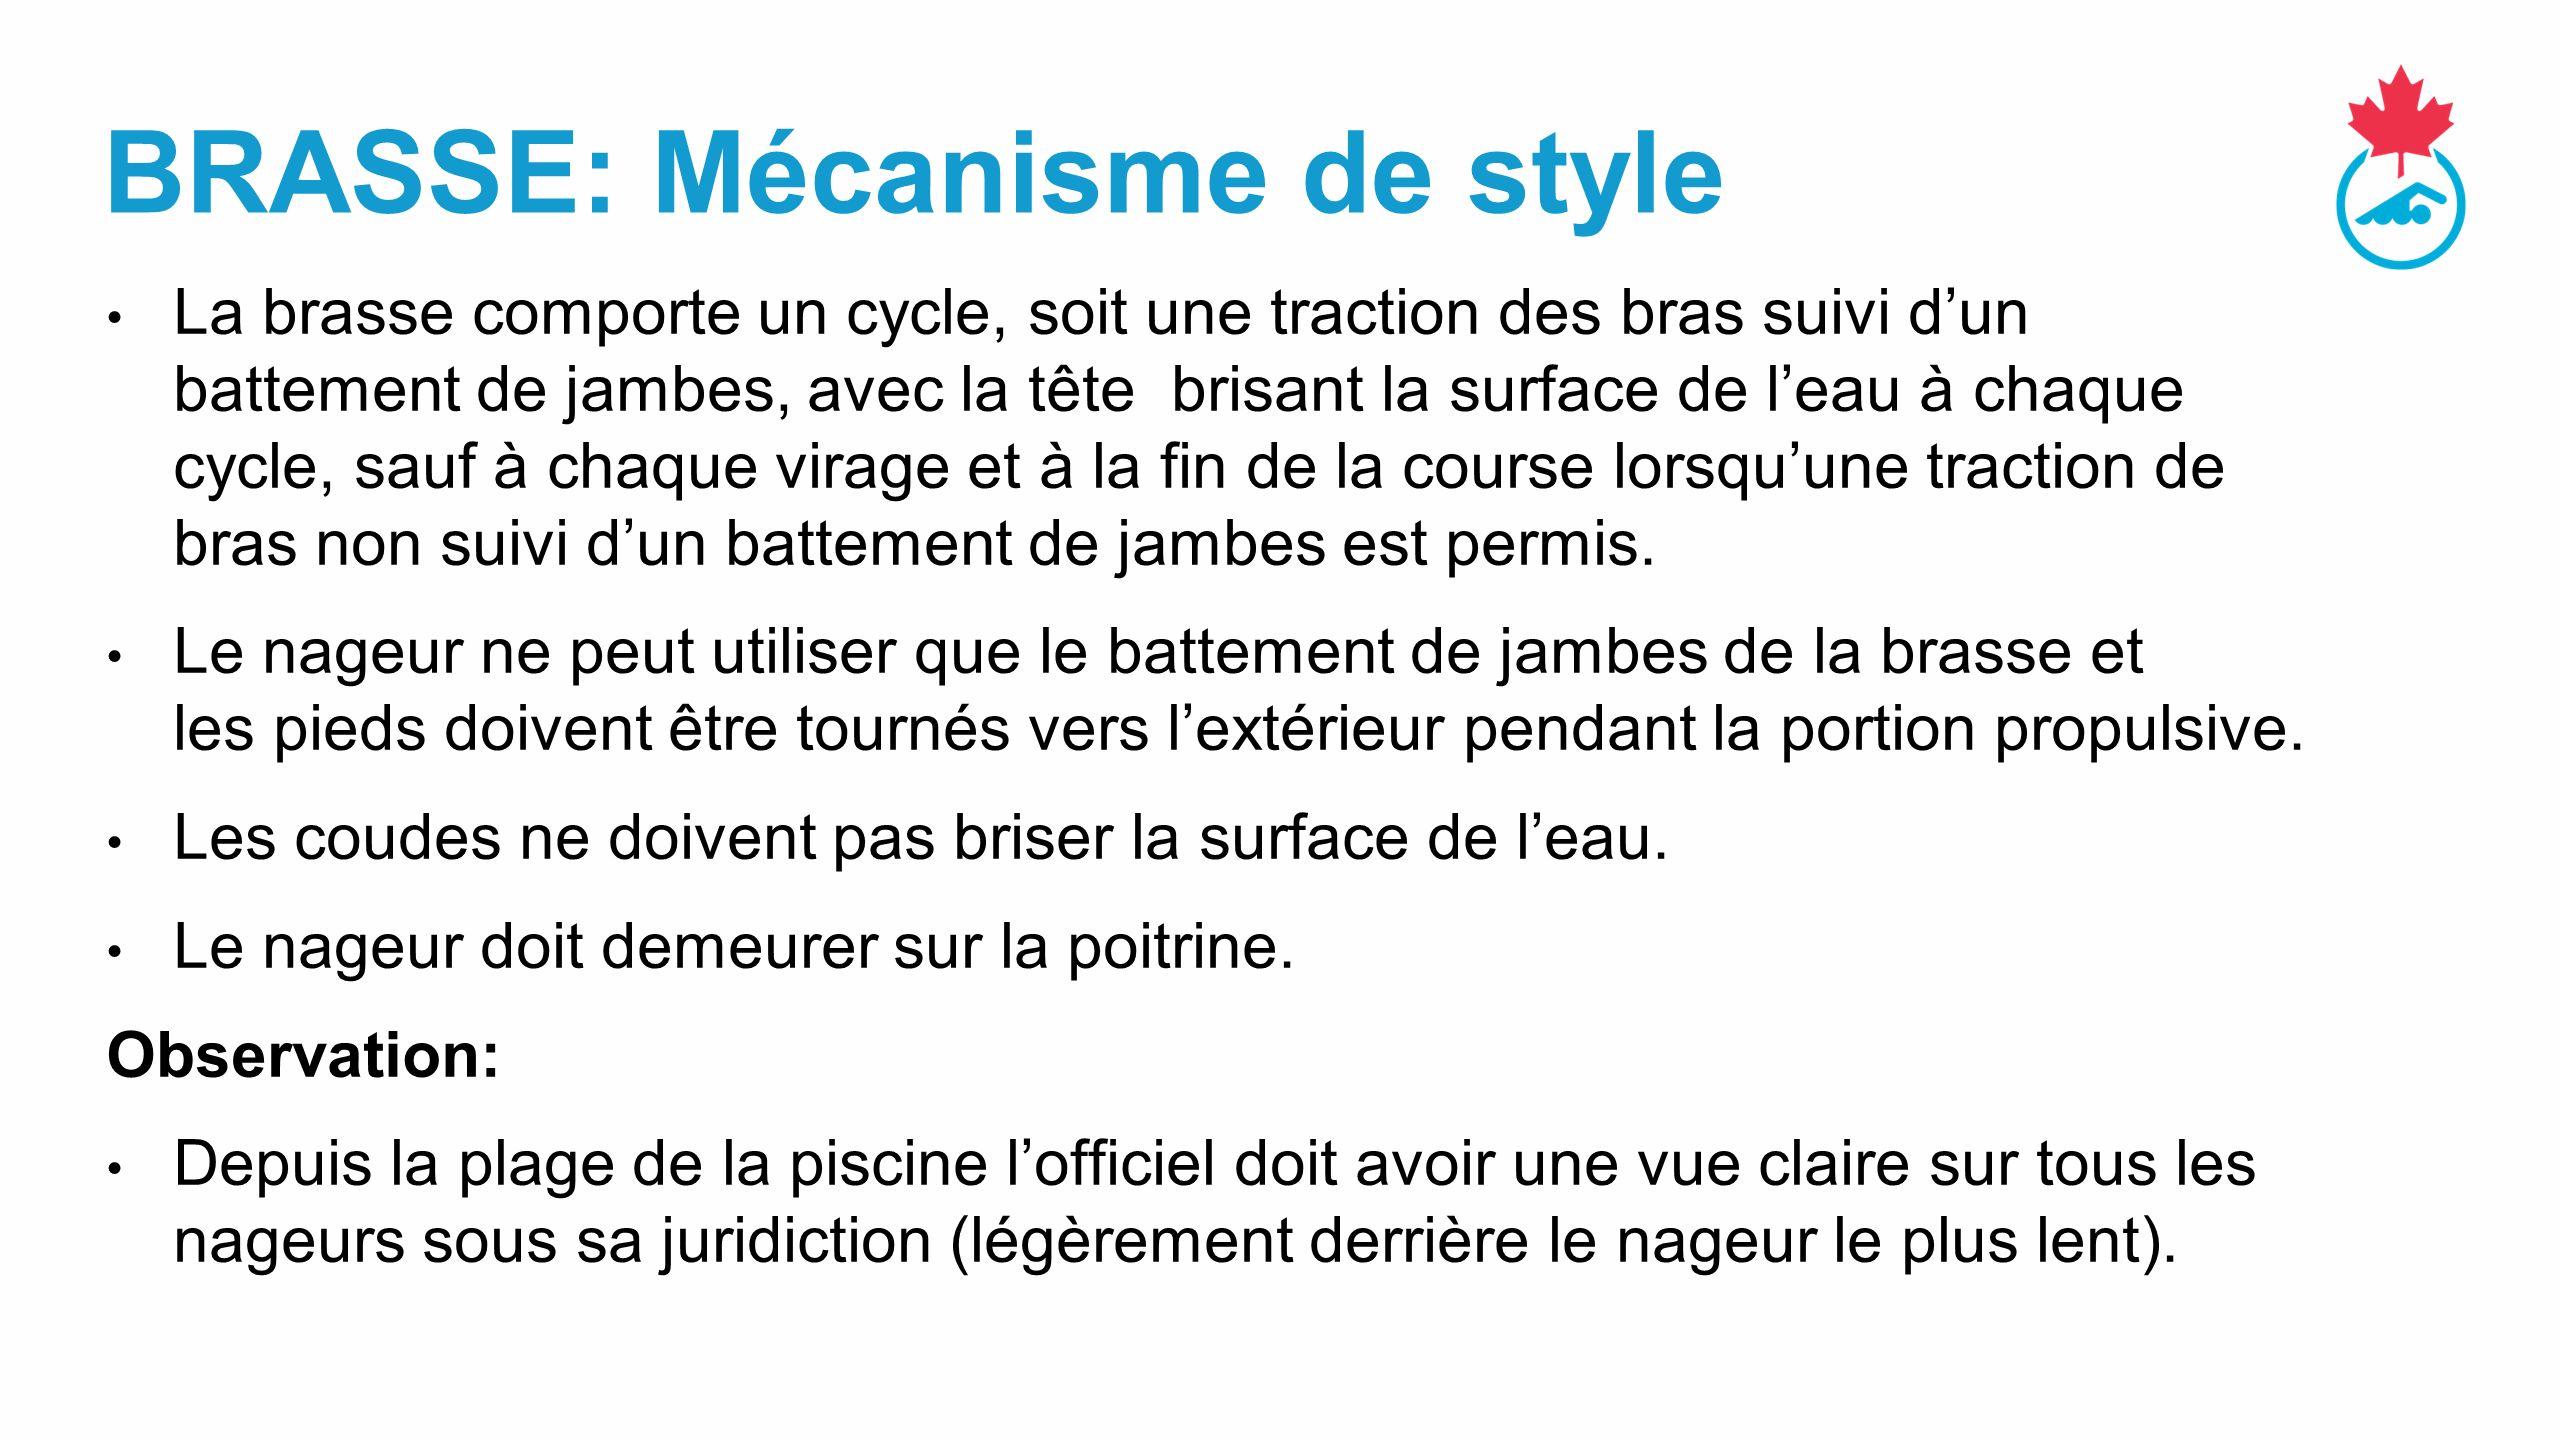 Brasse: Mécanisme de style